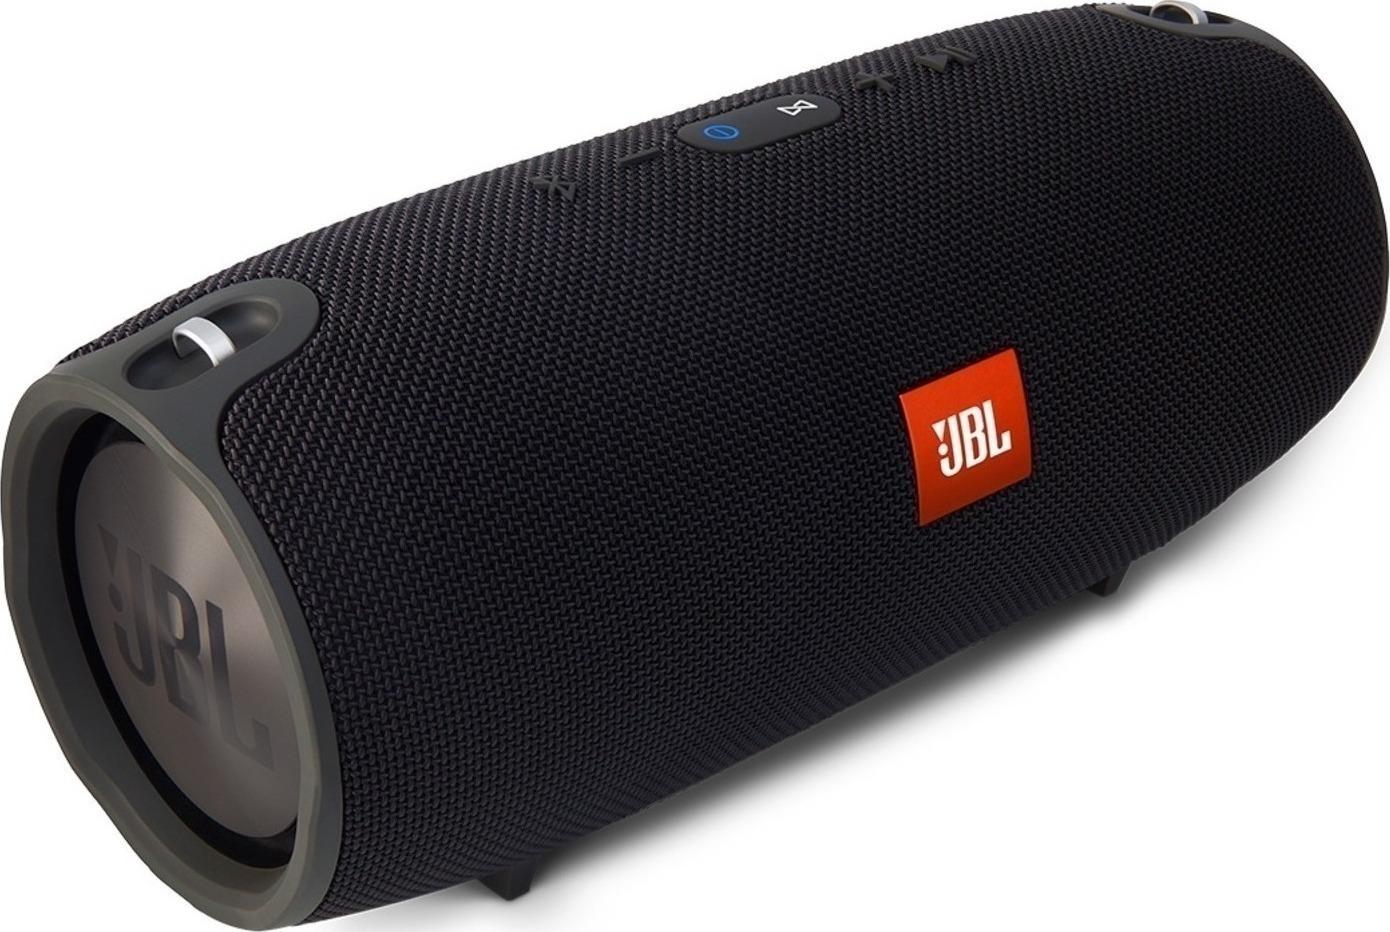 JBL Xtreme Bluetooth Αδιάβροχο Ηχείο Black (Πληρωμή έως 12 δόσεις)